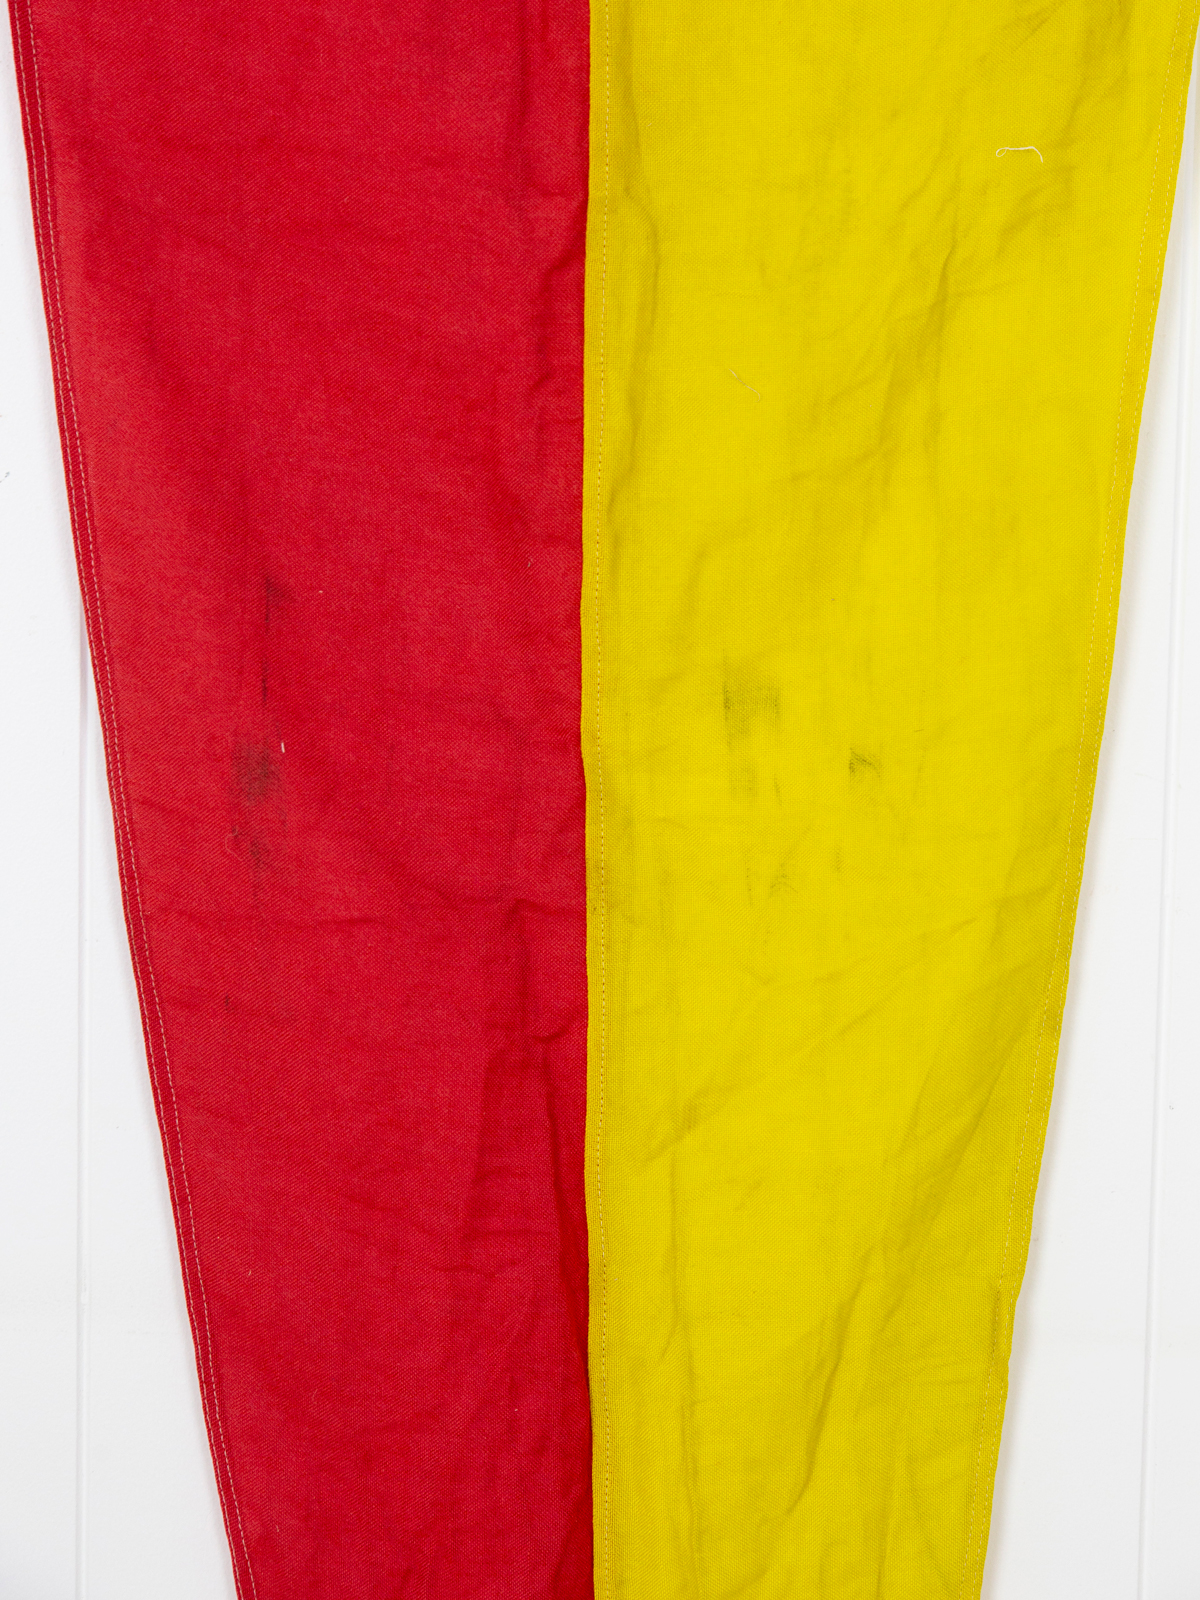 Pennant/Flag  No.7  #6073